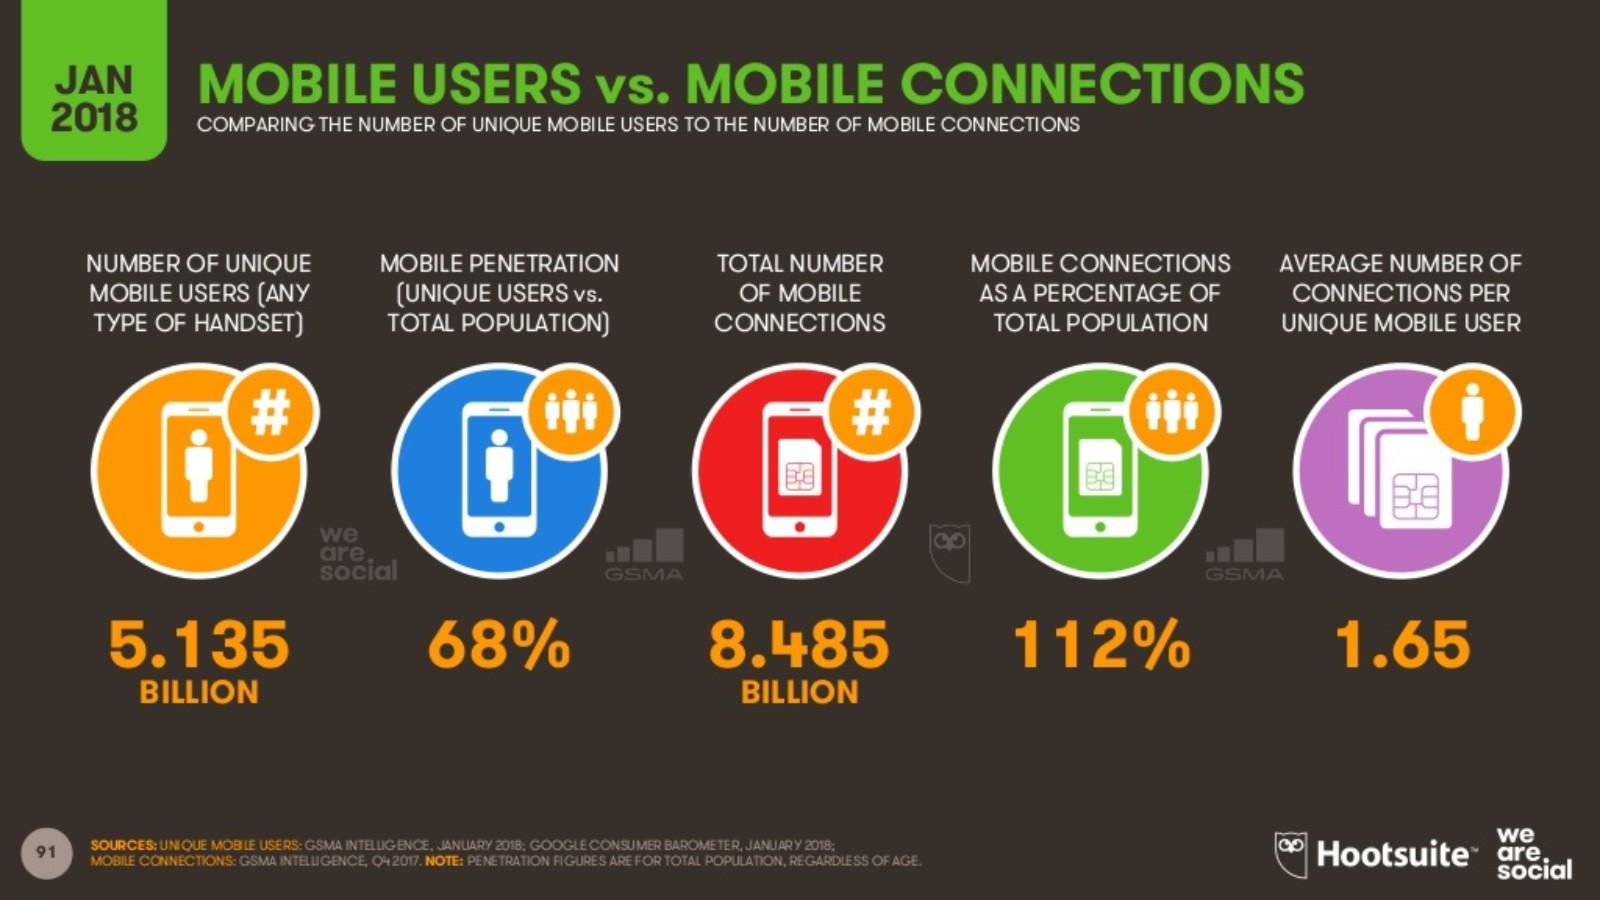 móviles conectados a internet 3